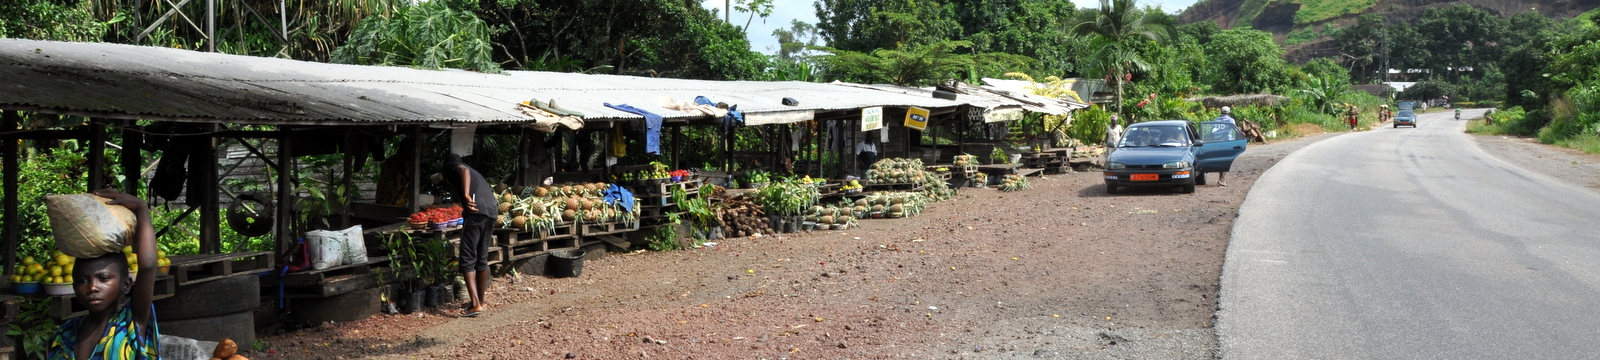 Cameroon_Food_Stalls